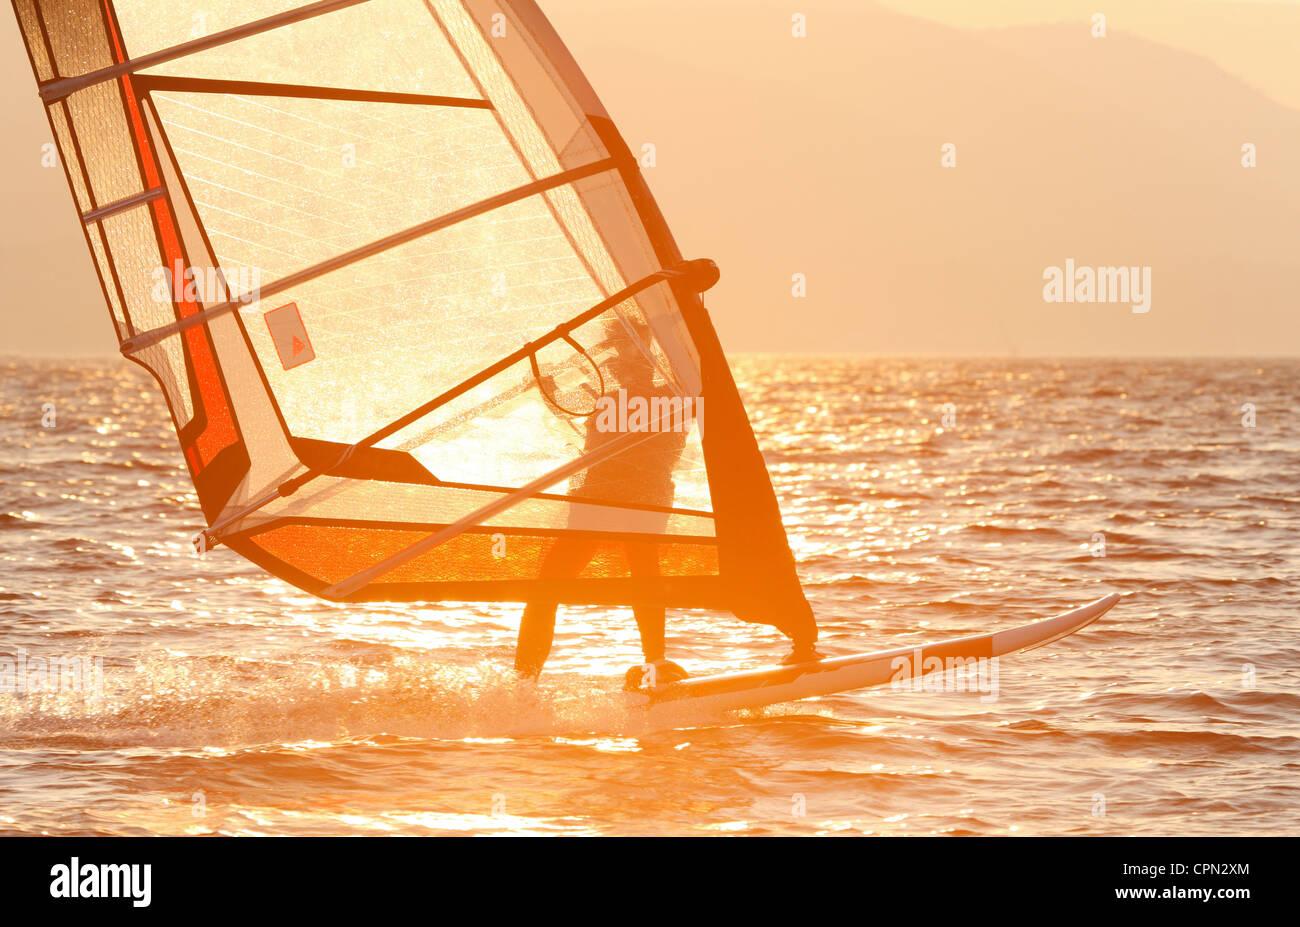 Windsurf Imagen De Stock